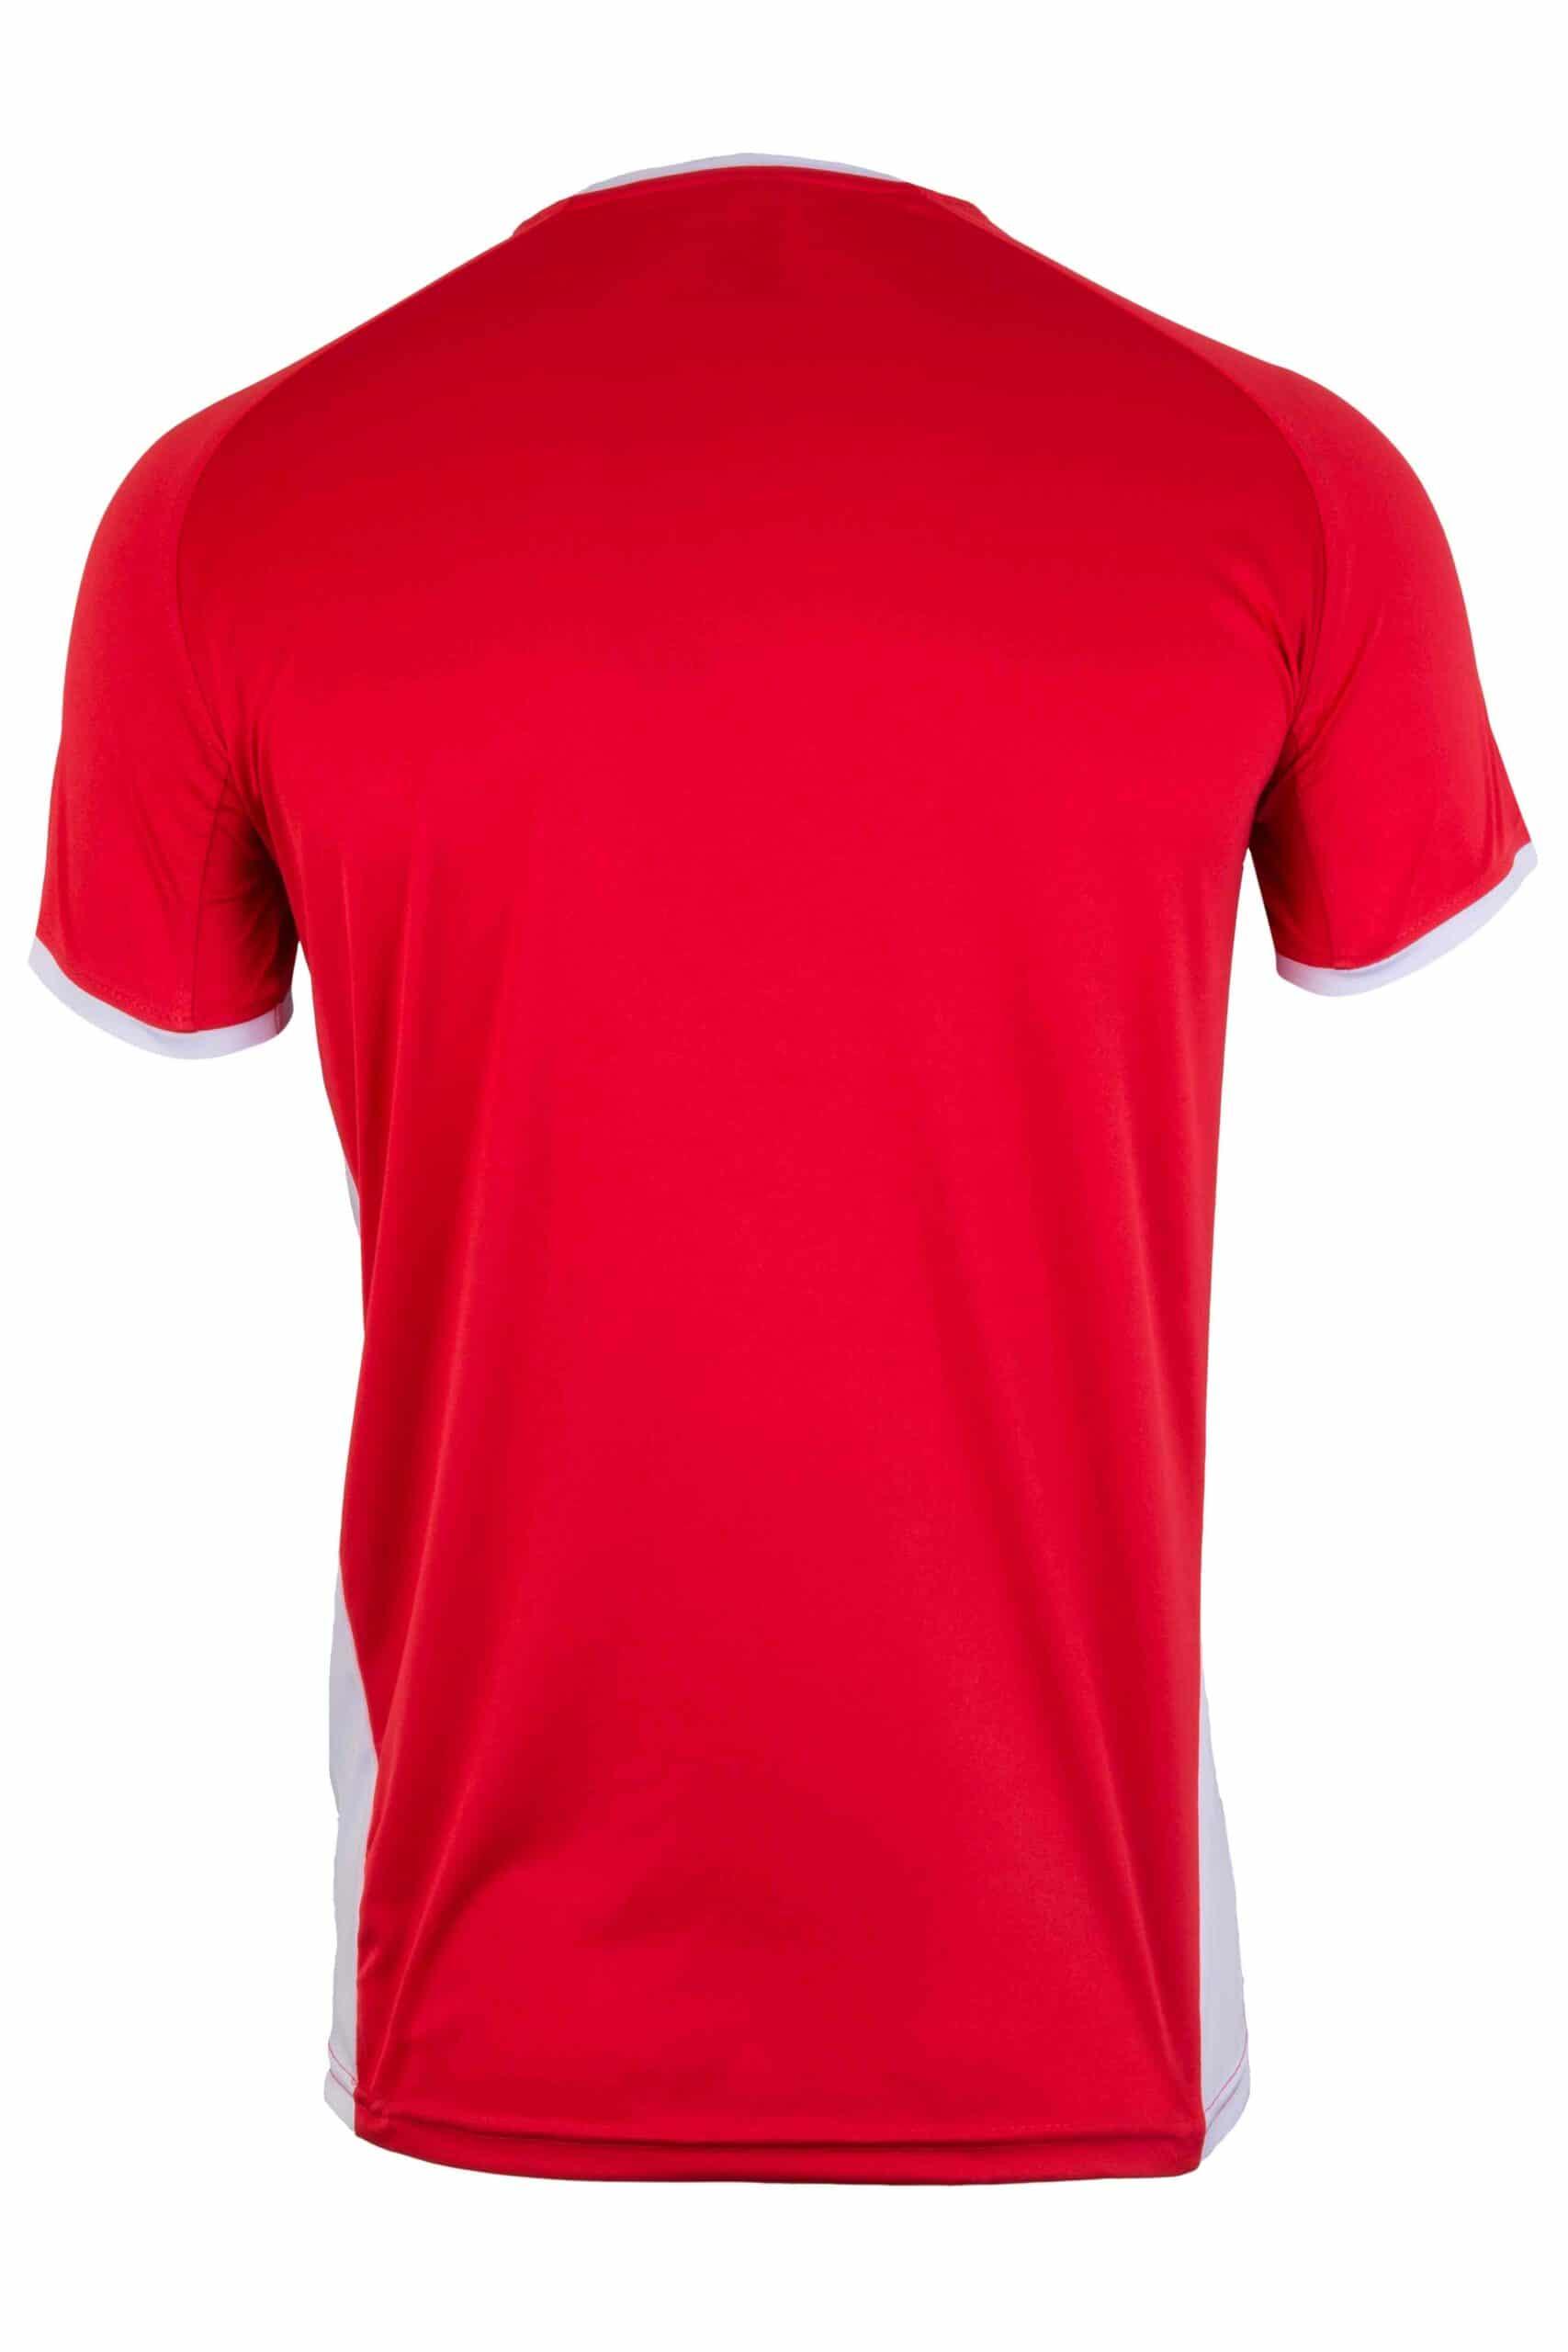 Mukua Mk530v Mukua Camiseta TÉcnica Manga Corta Bicolor Red White 2